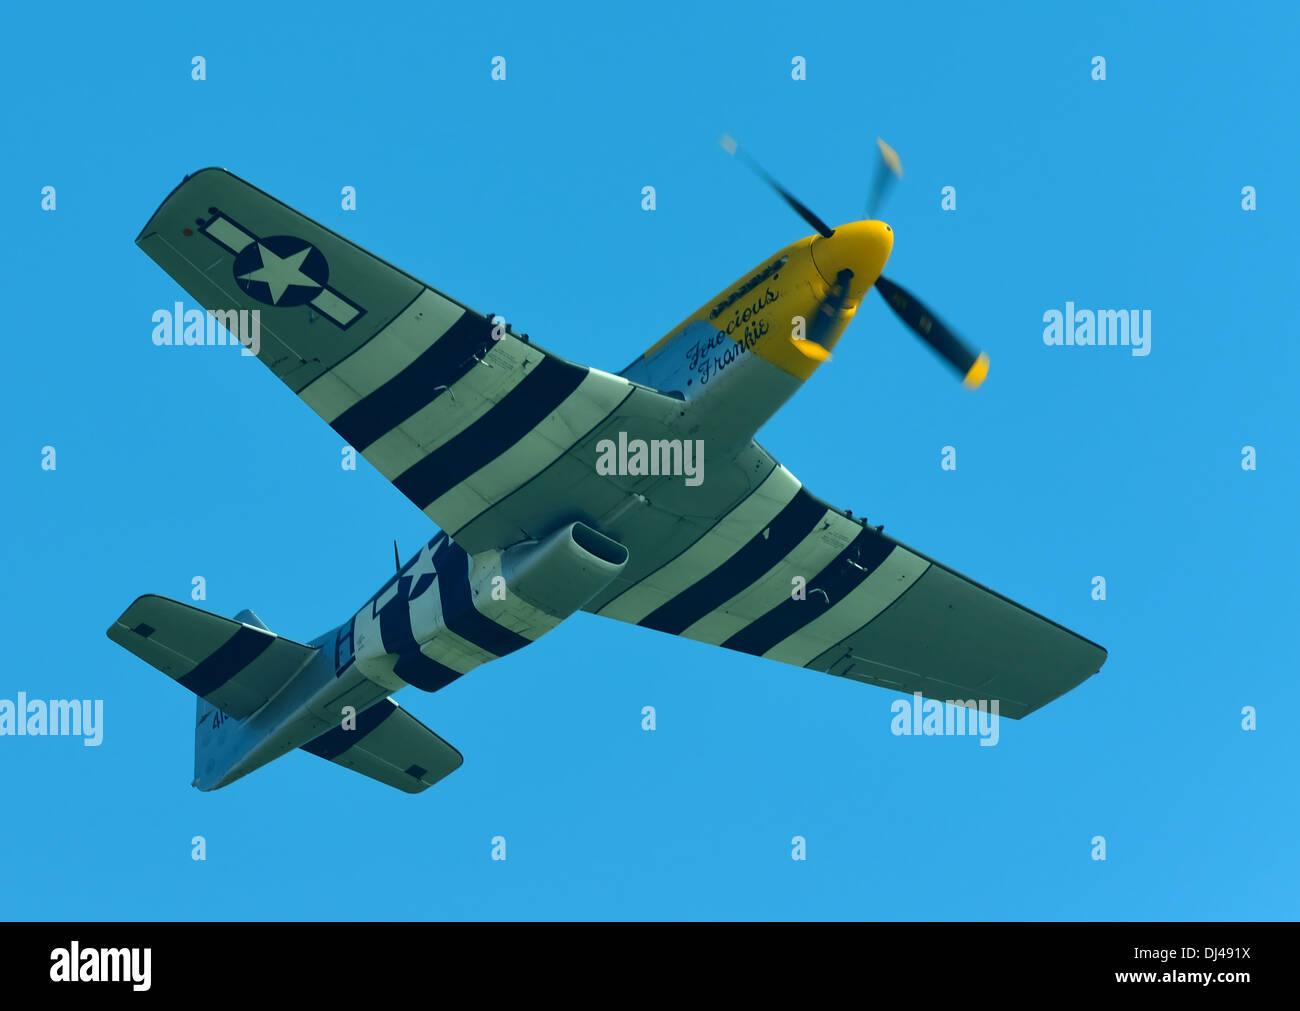 Mustang Fighter Plane Fighter Planes Of World War 2 Usaf